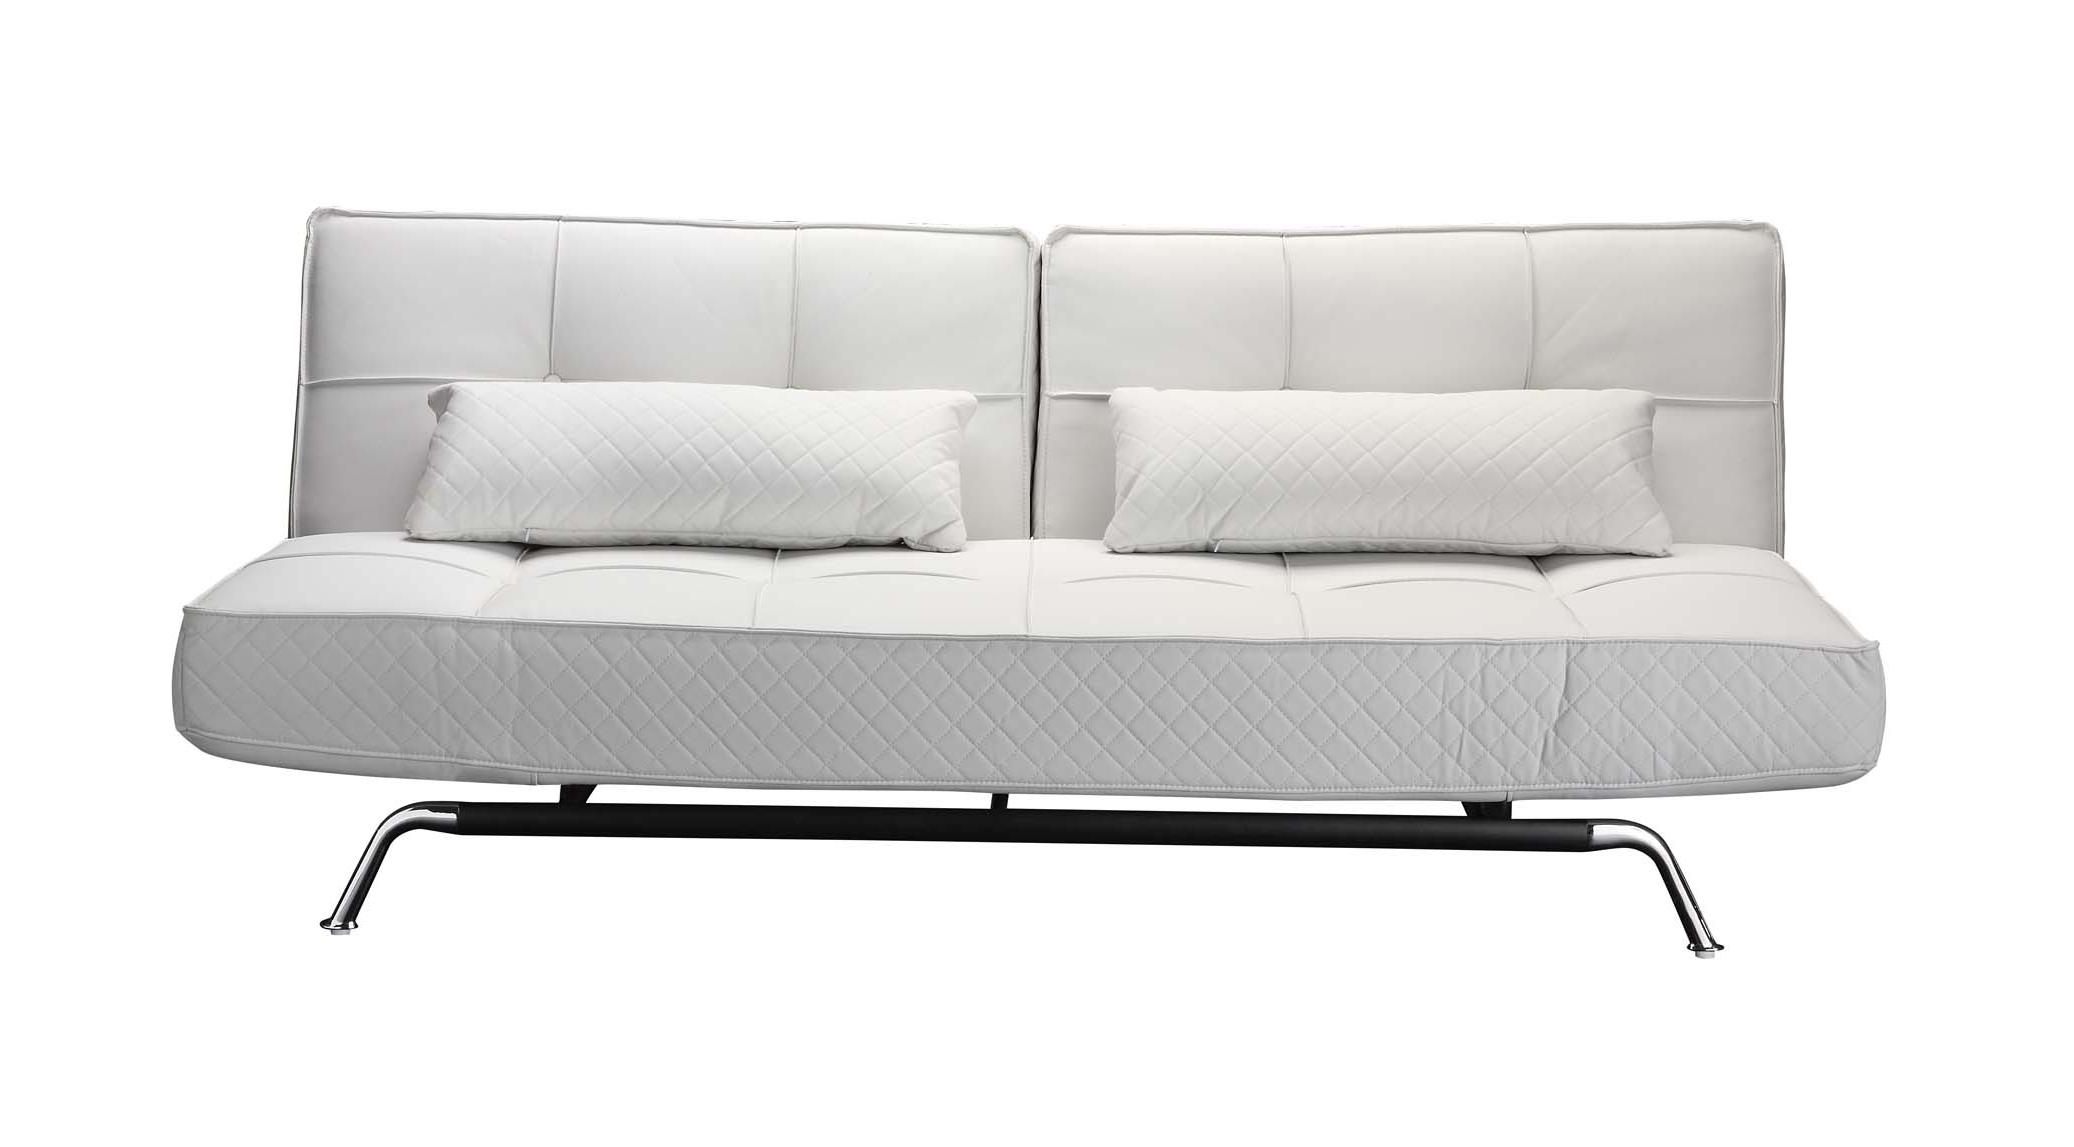 Trendy Amazing White Modern Sofa 24 In Contemporary Sofa Inspiration With Inside White Modern Sofas (View 10 of 15)